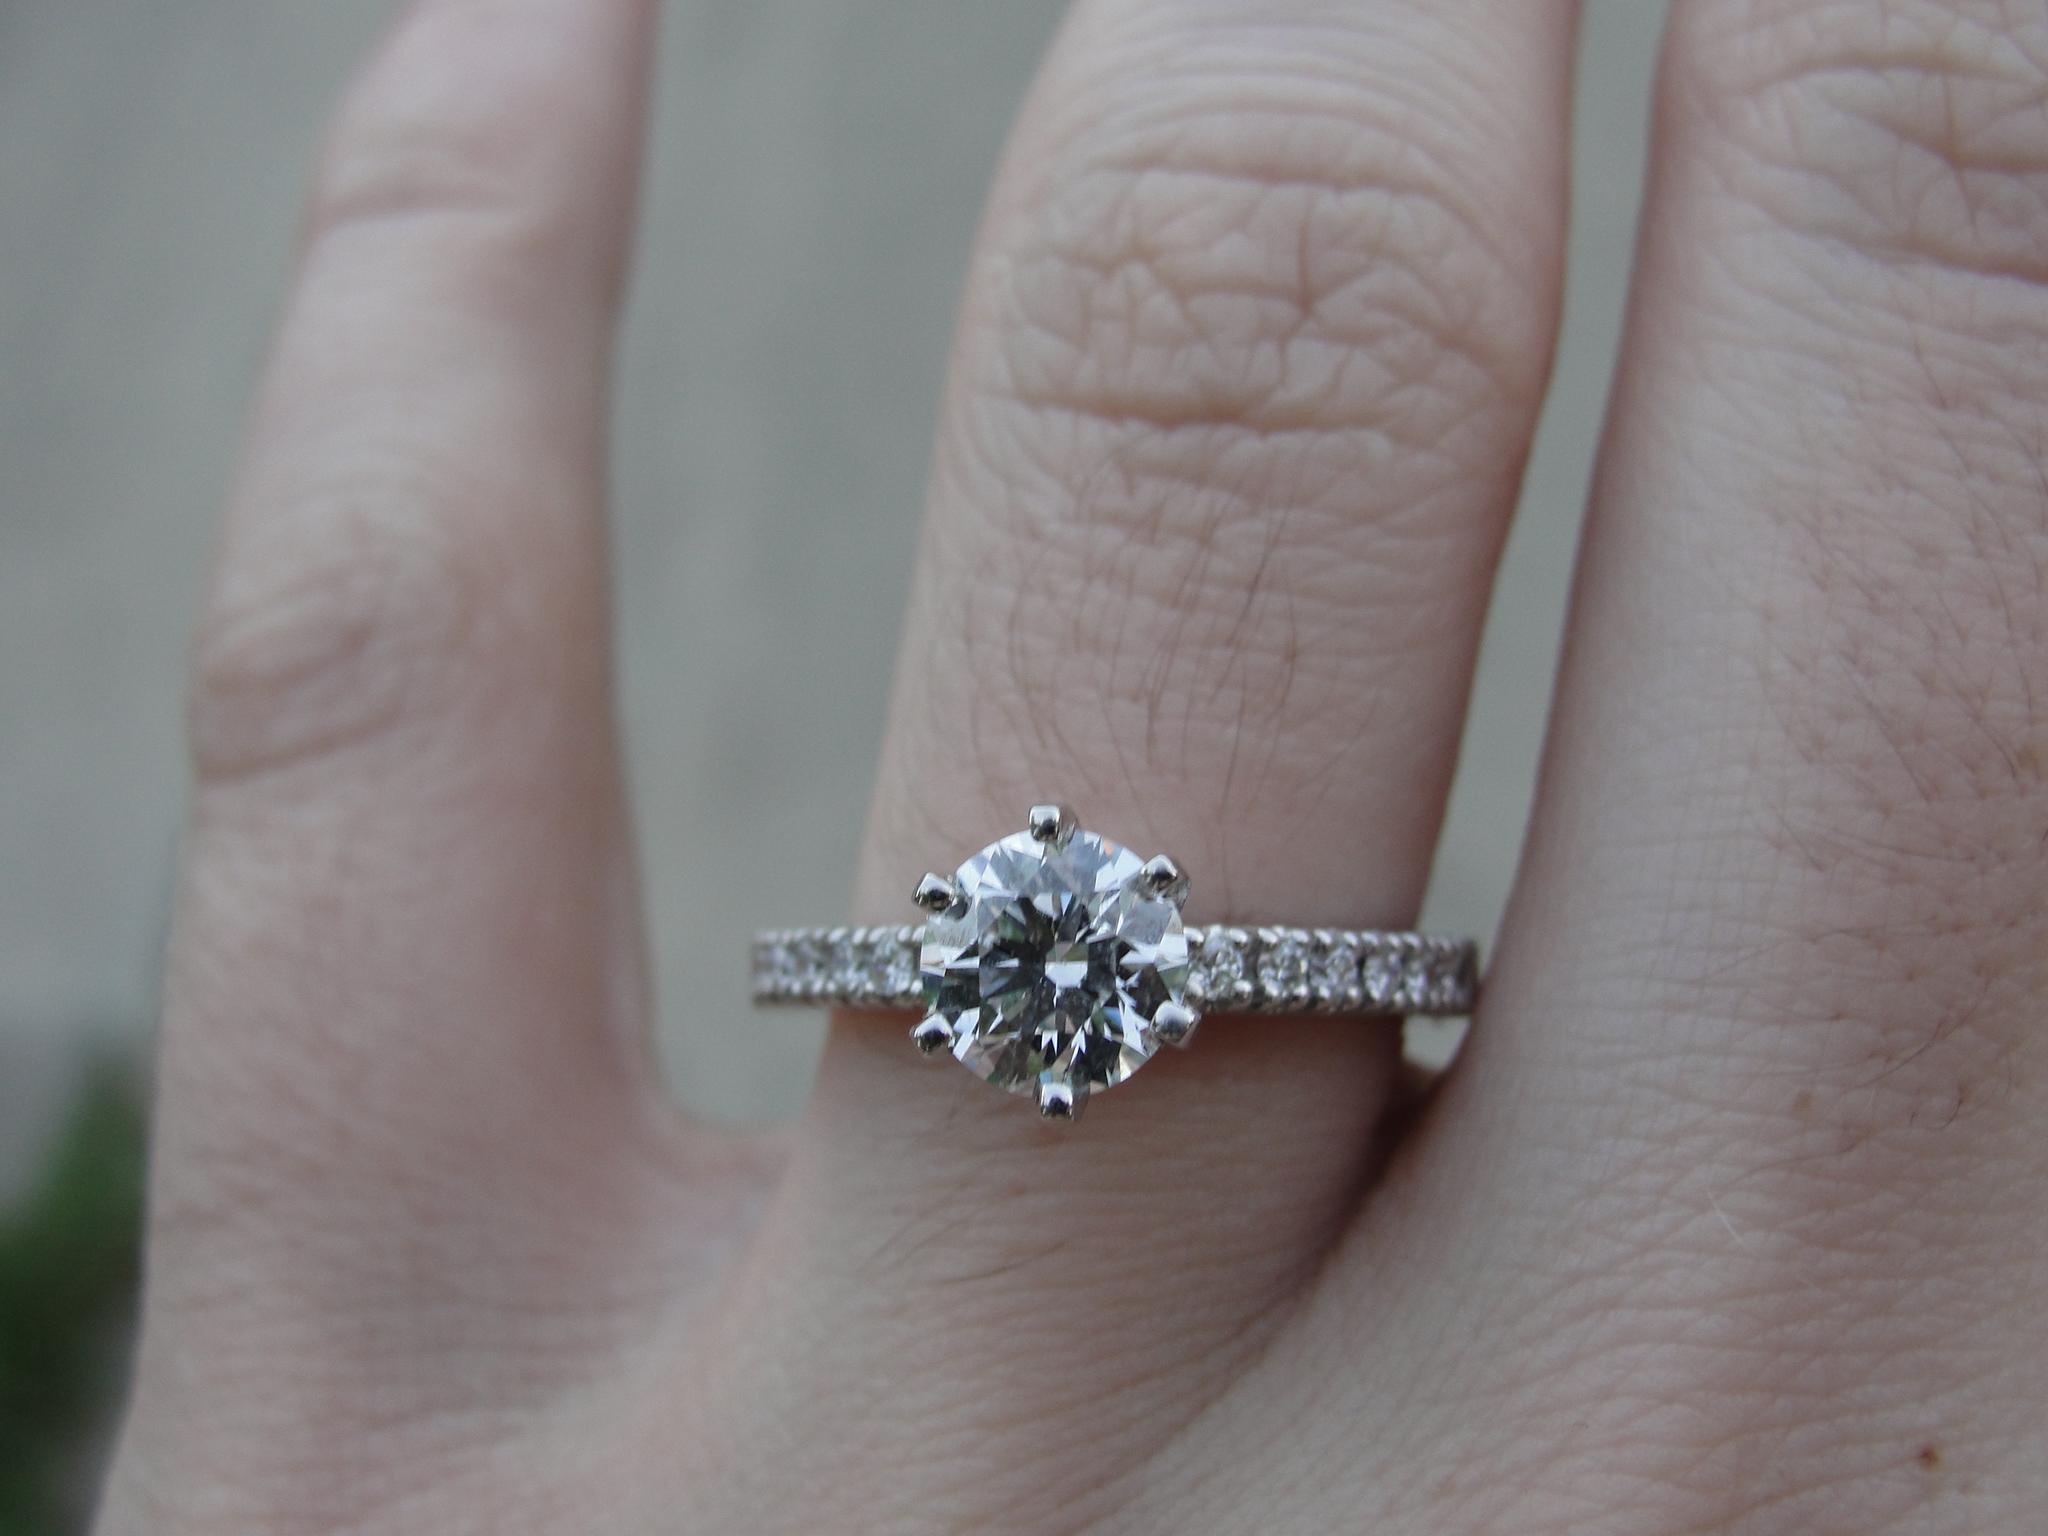 Emily's engagement ring